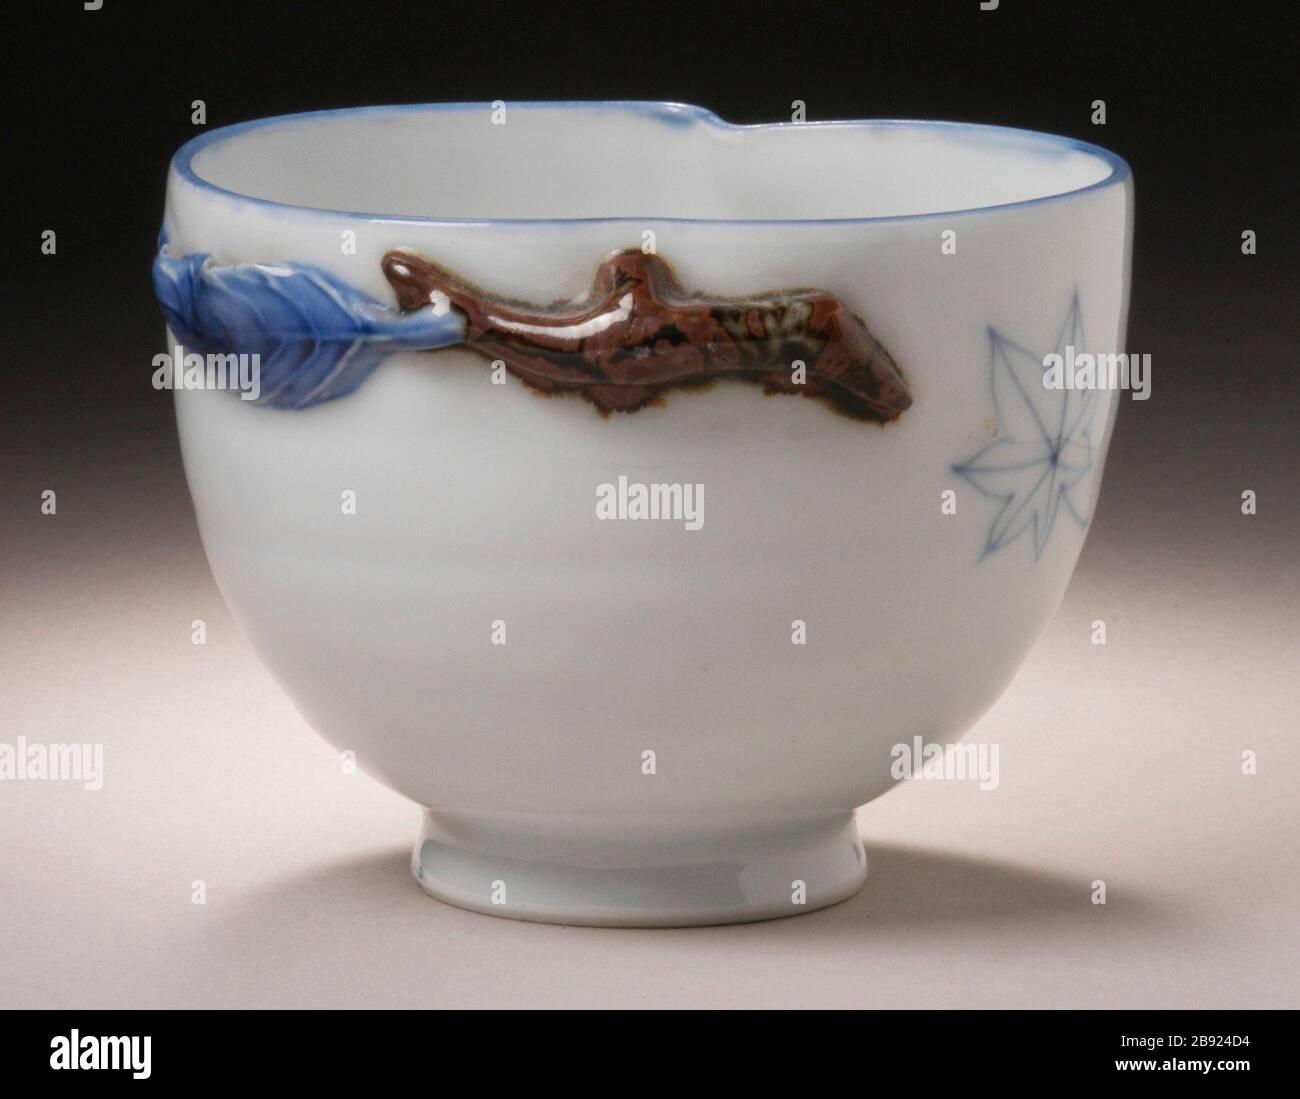 Antique Japanese Porcelain Bowl Blue and White Harbor /& Lanscape 19th //20th c.